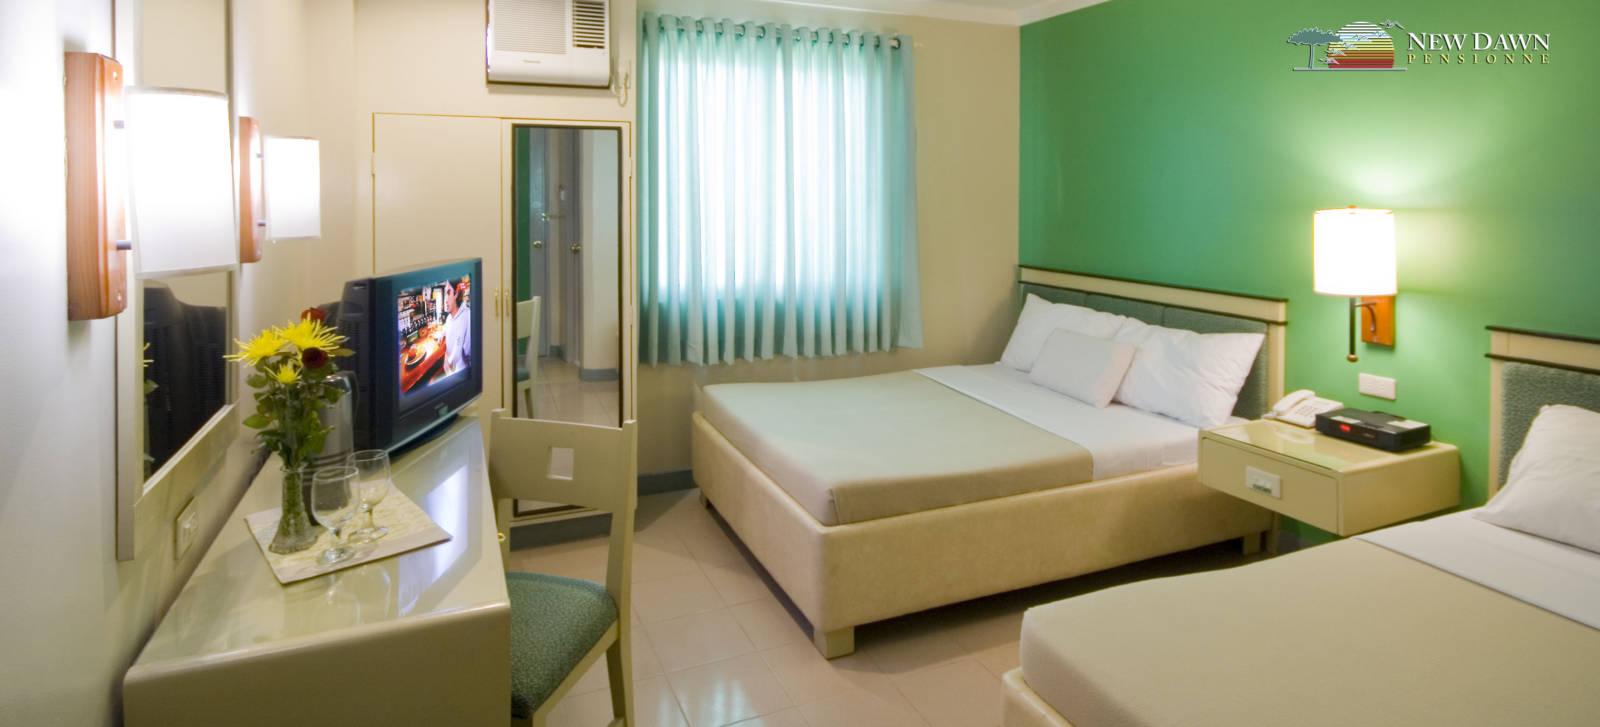 New Dawn Pensionne - Standard Room